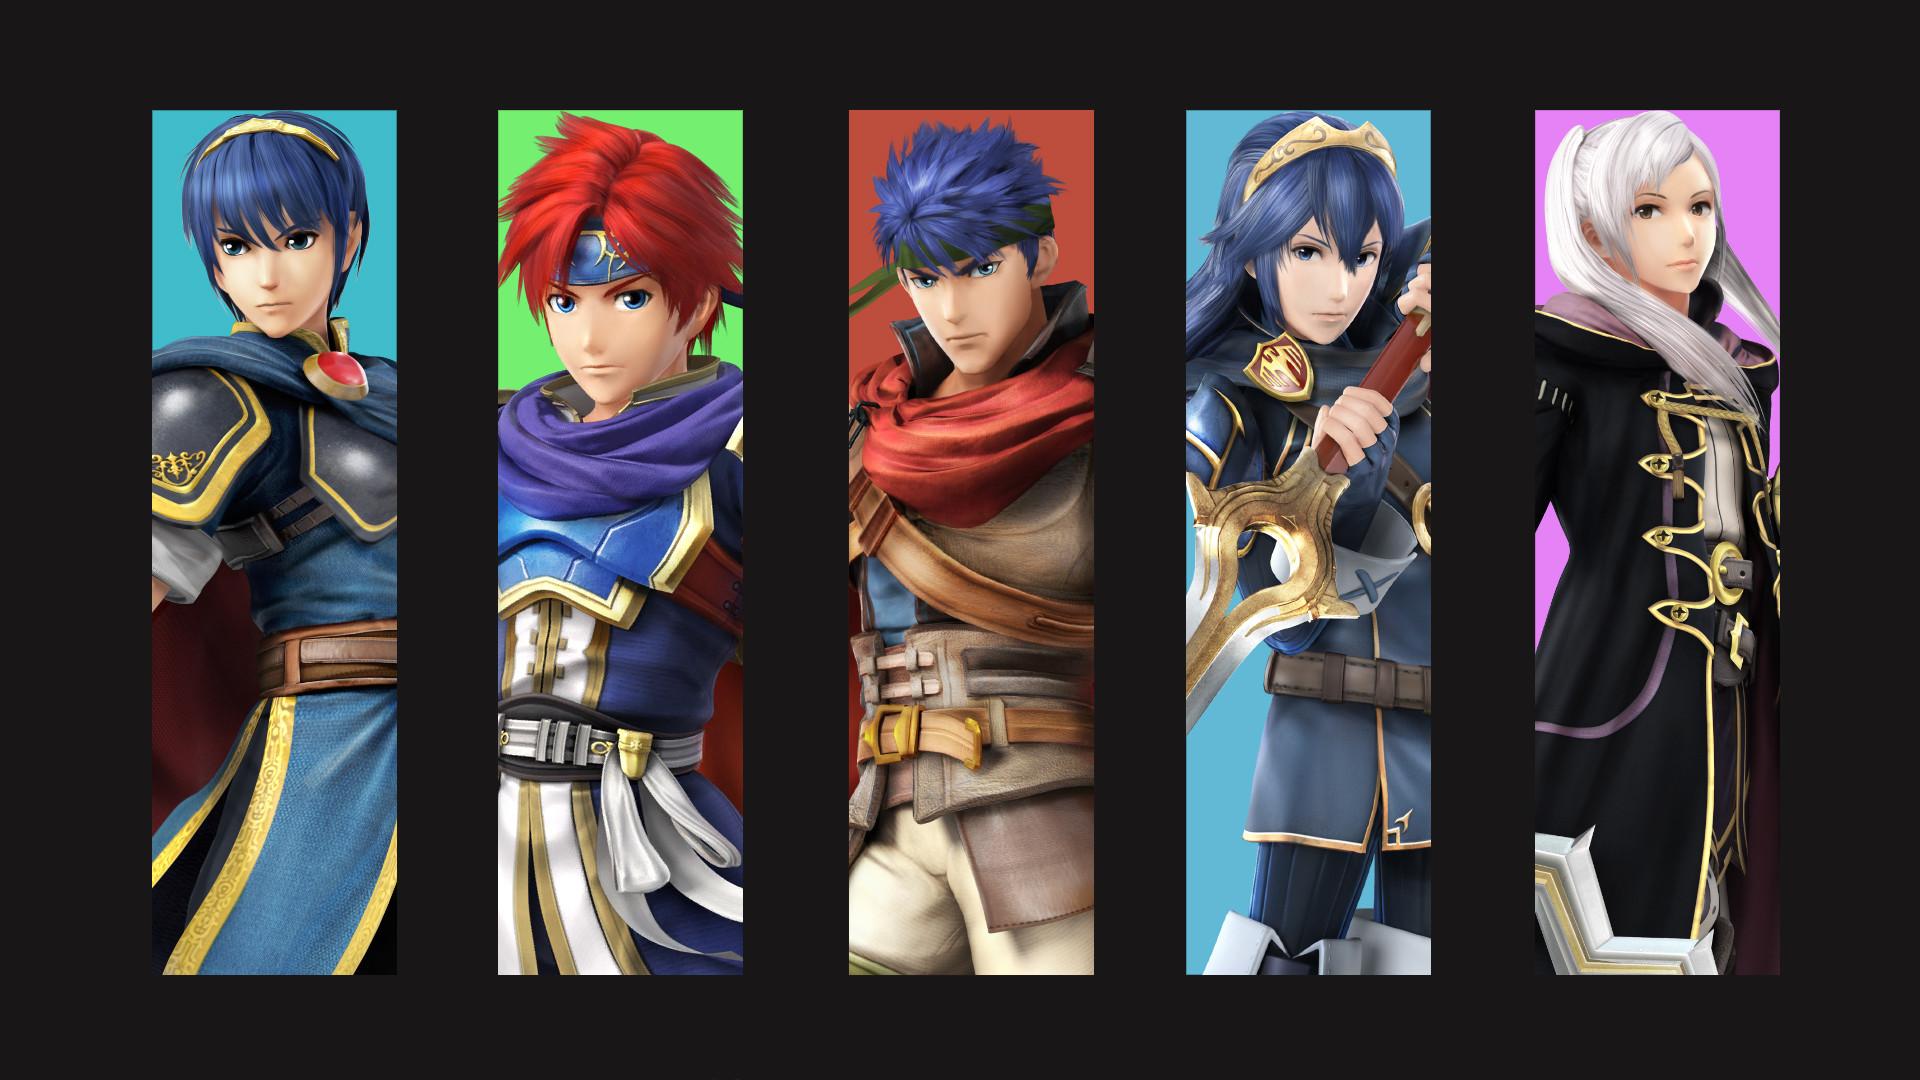 … Fire Emblem Smash Bros Cast by zupertompa